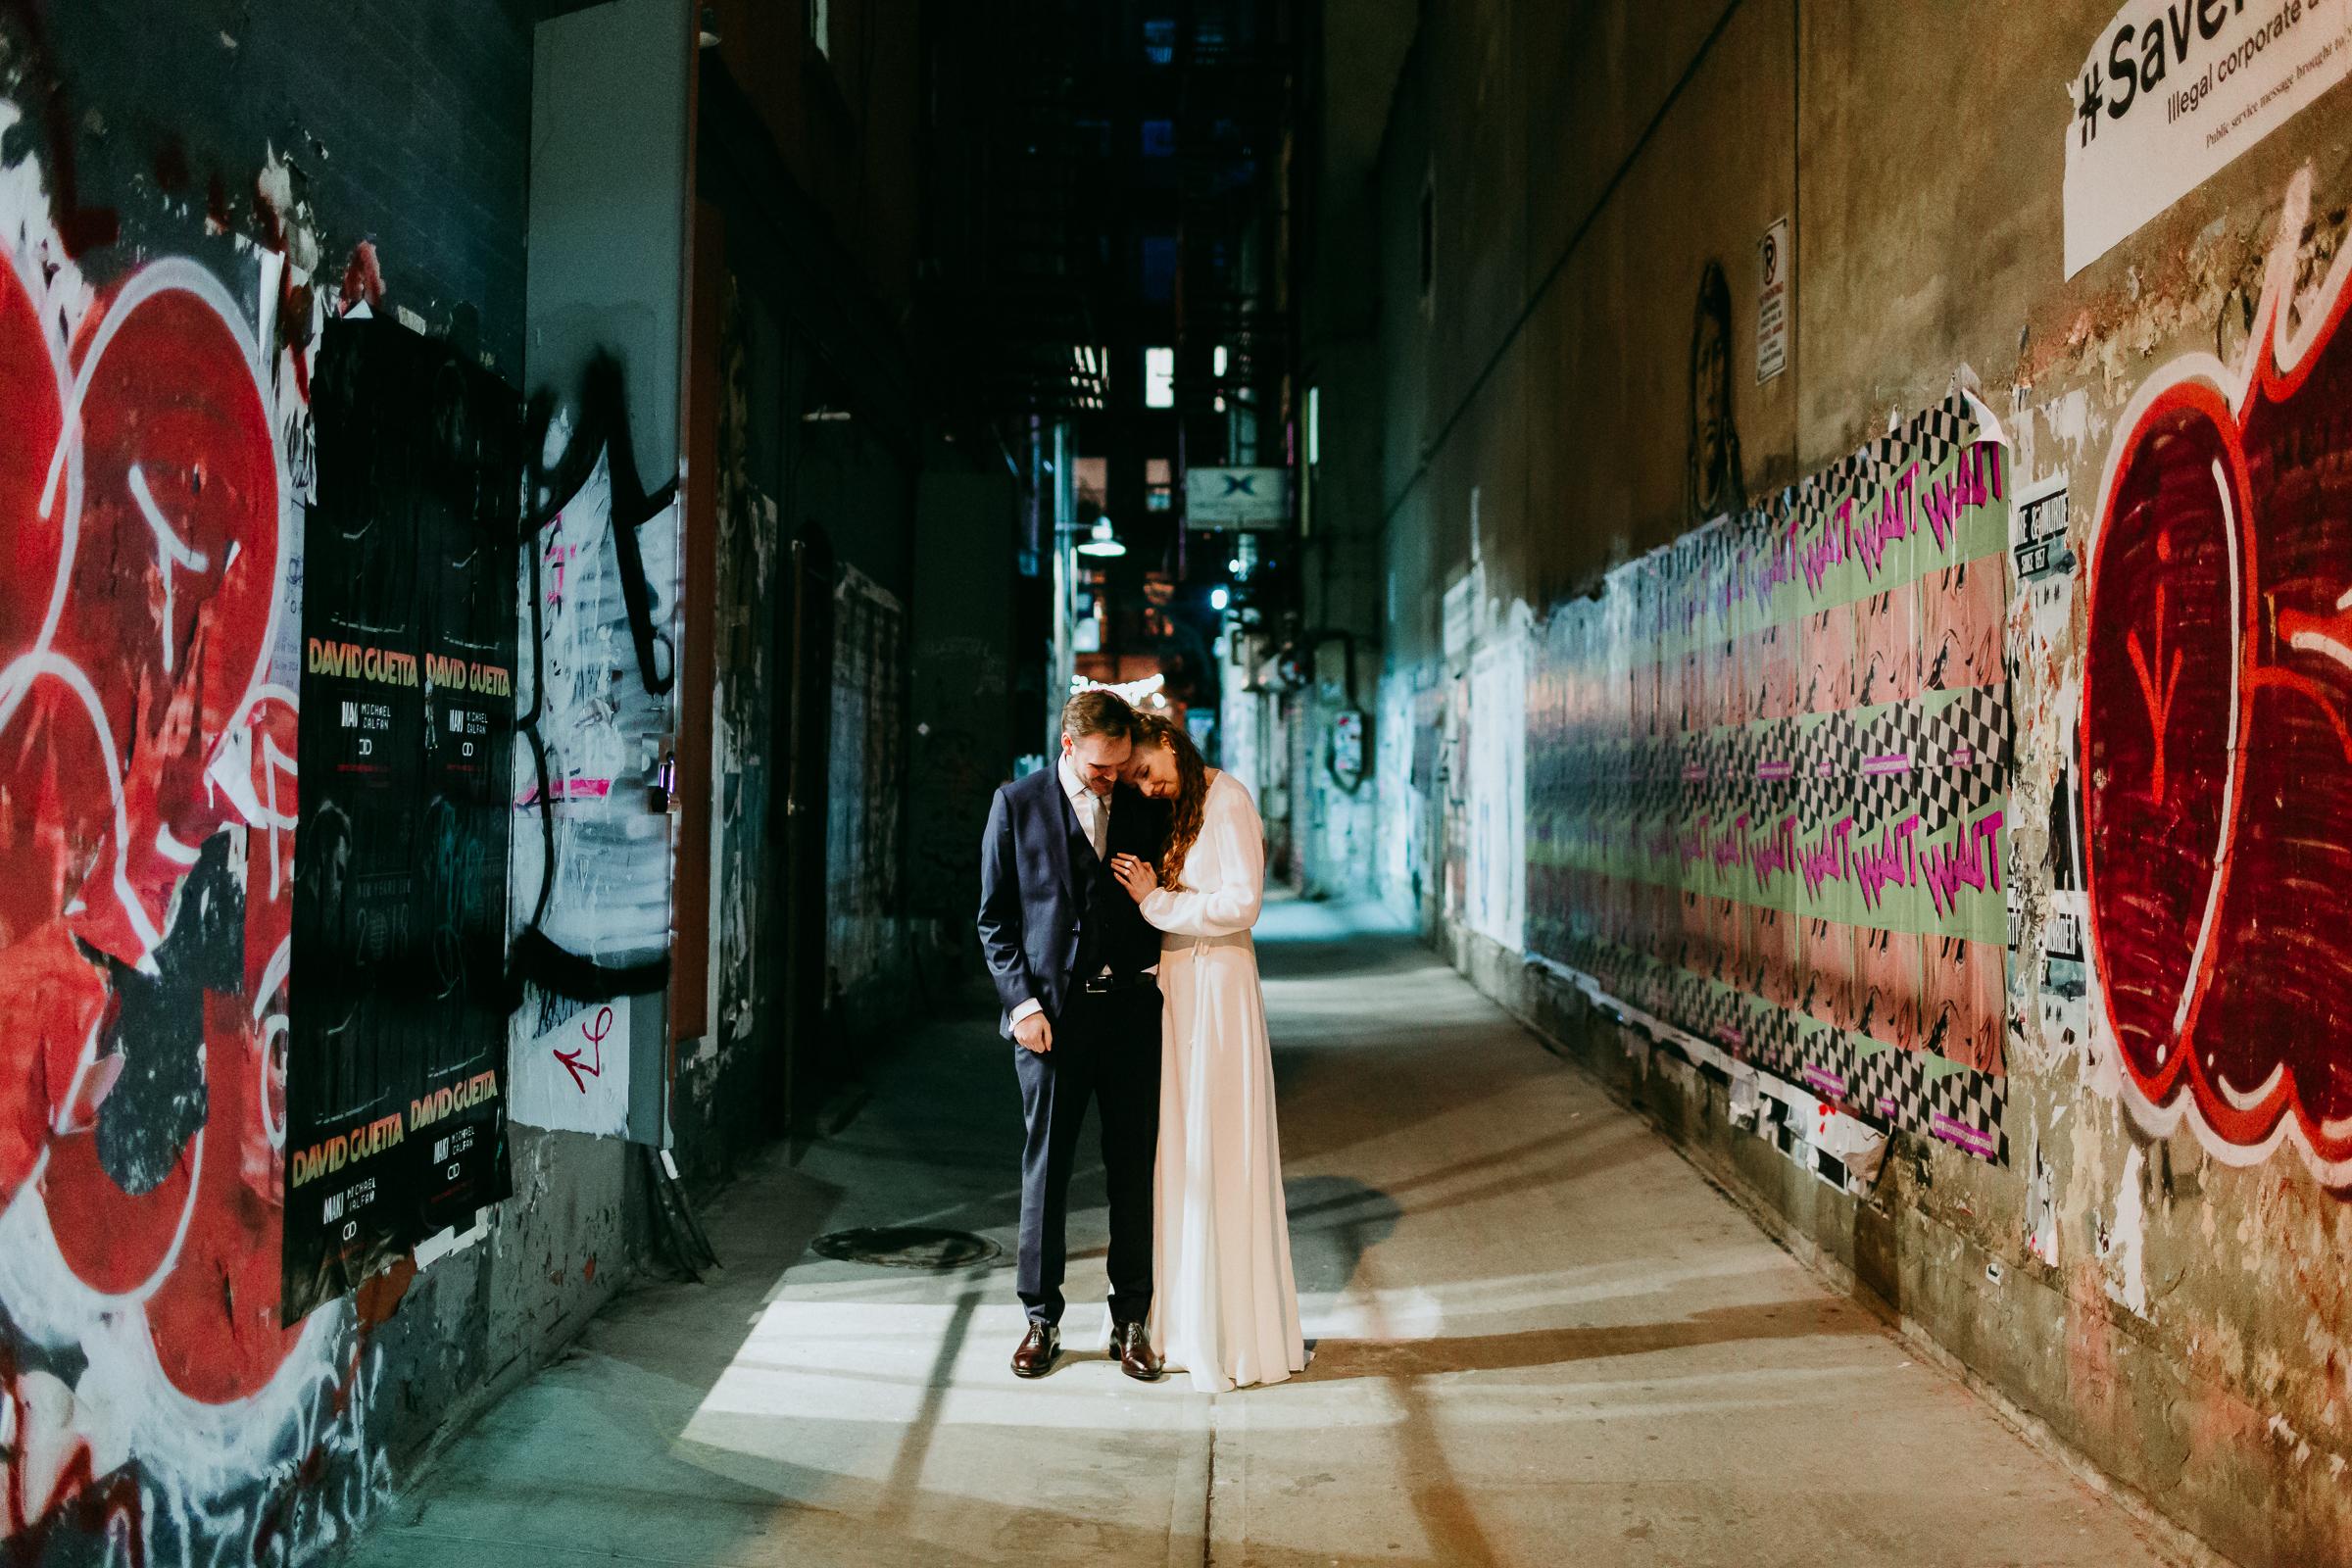 Freemans-Restaurant-Soho-Brooklyn-Bridge-Park-Dumbo-Documentary-Wedding-Photographer-35.jpg